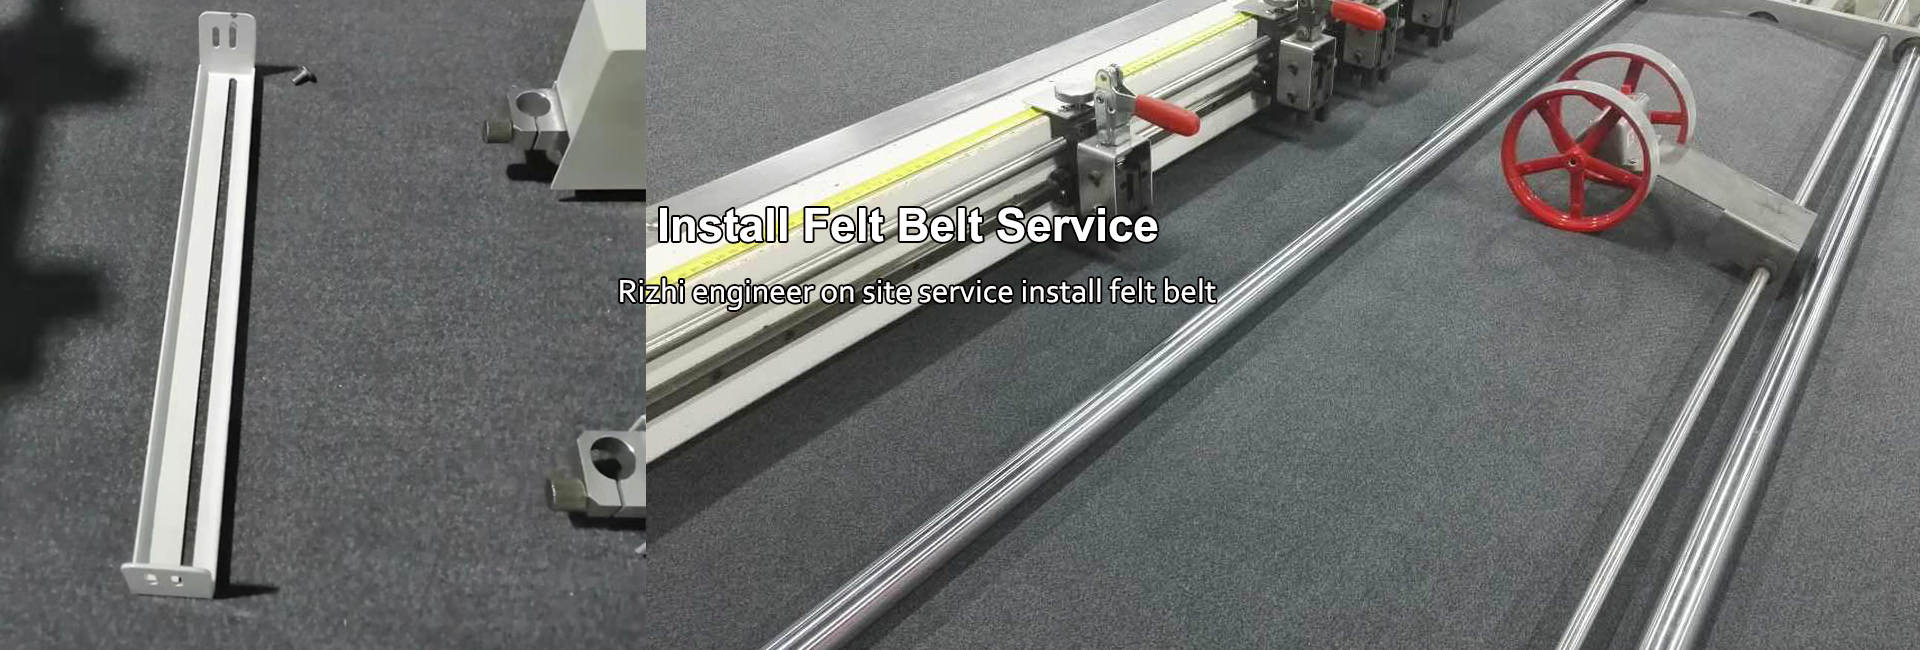 Install Felt Belt Service